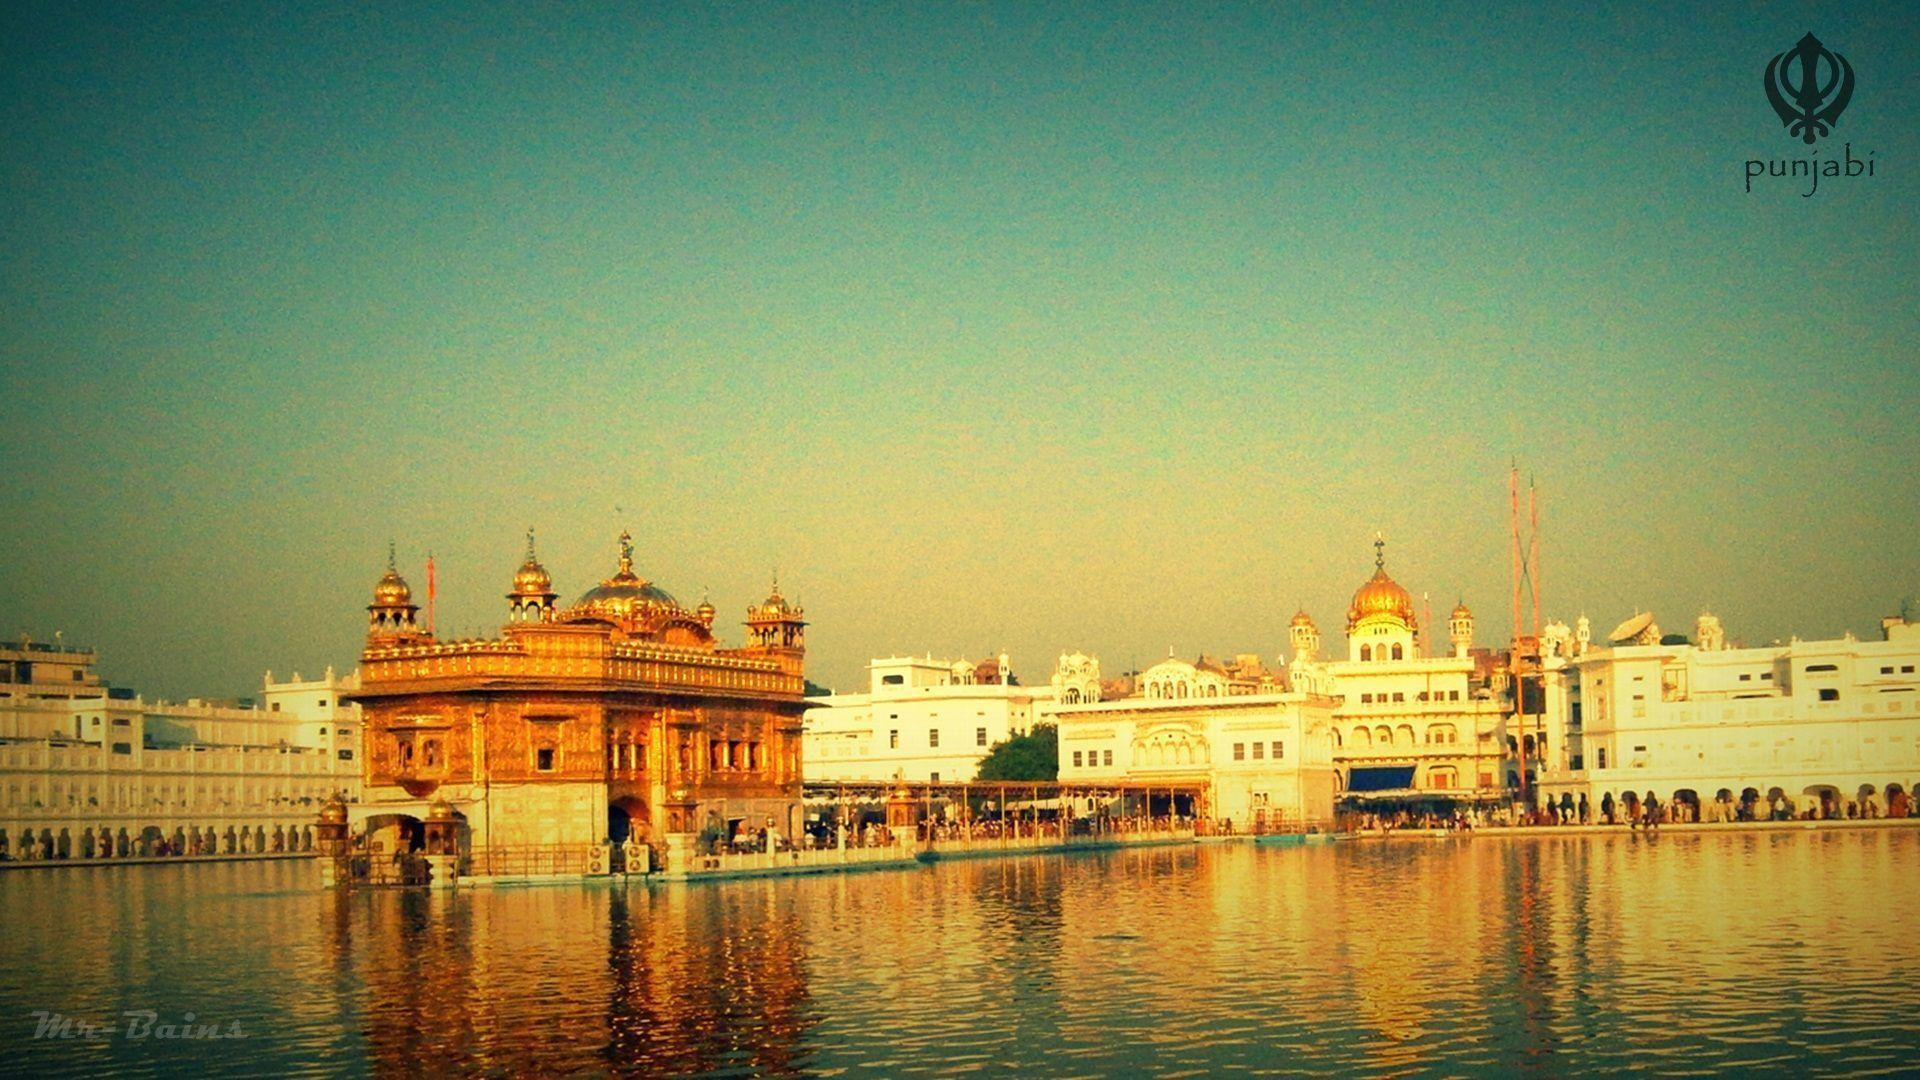 Beautiful Wallpaper High Resolution Sikh - 1050688-punjab-wallpapers-1920x1080-hd-1080p  Best Photo Reference_773118.jpg